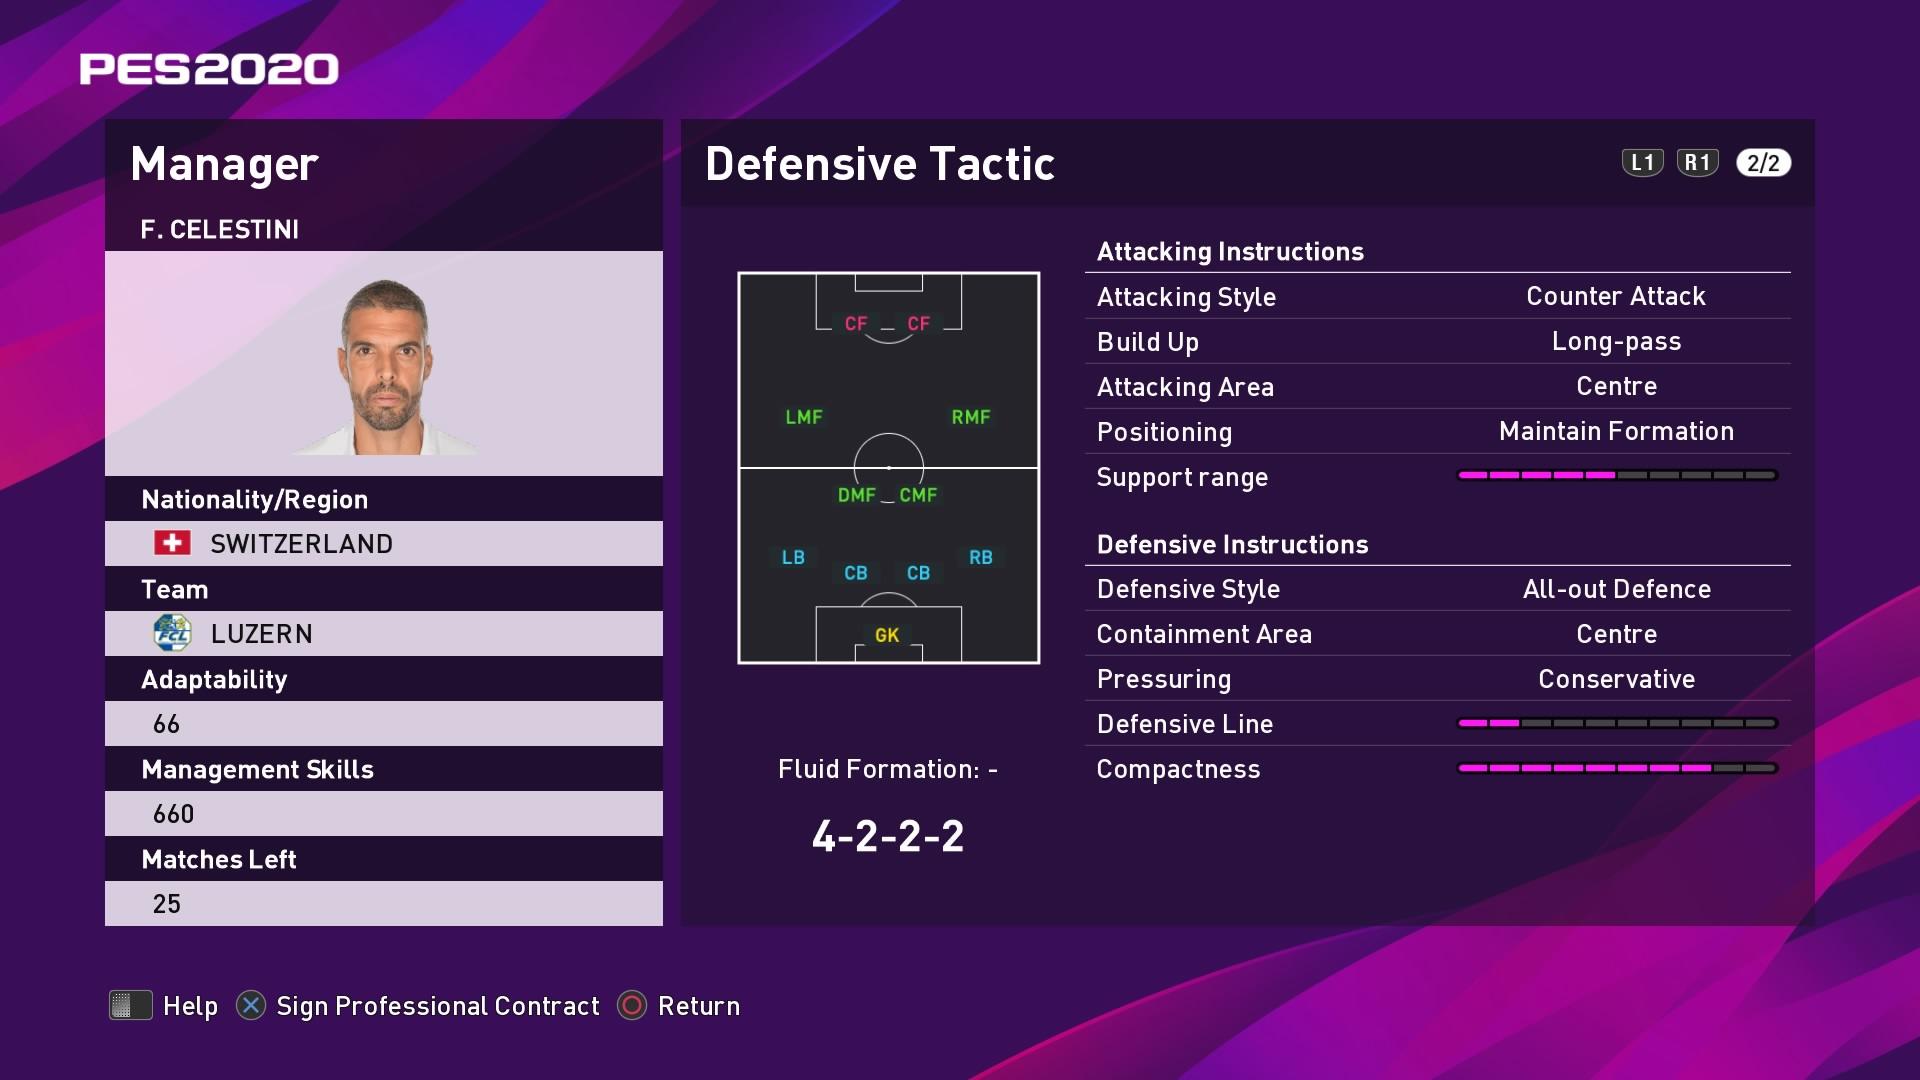 F. Celestini (Fabio Celestini) Defensive Tactic in PES 2020 myClub